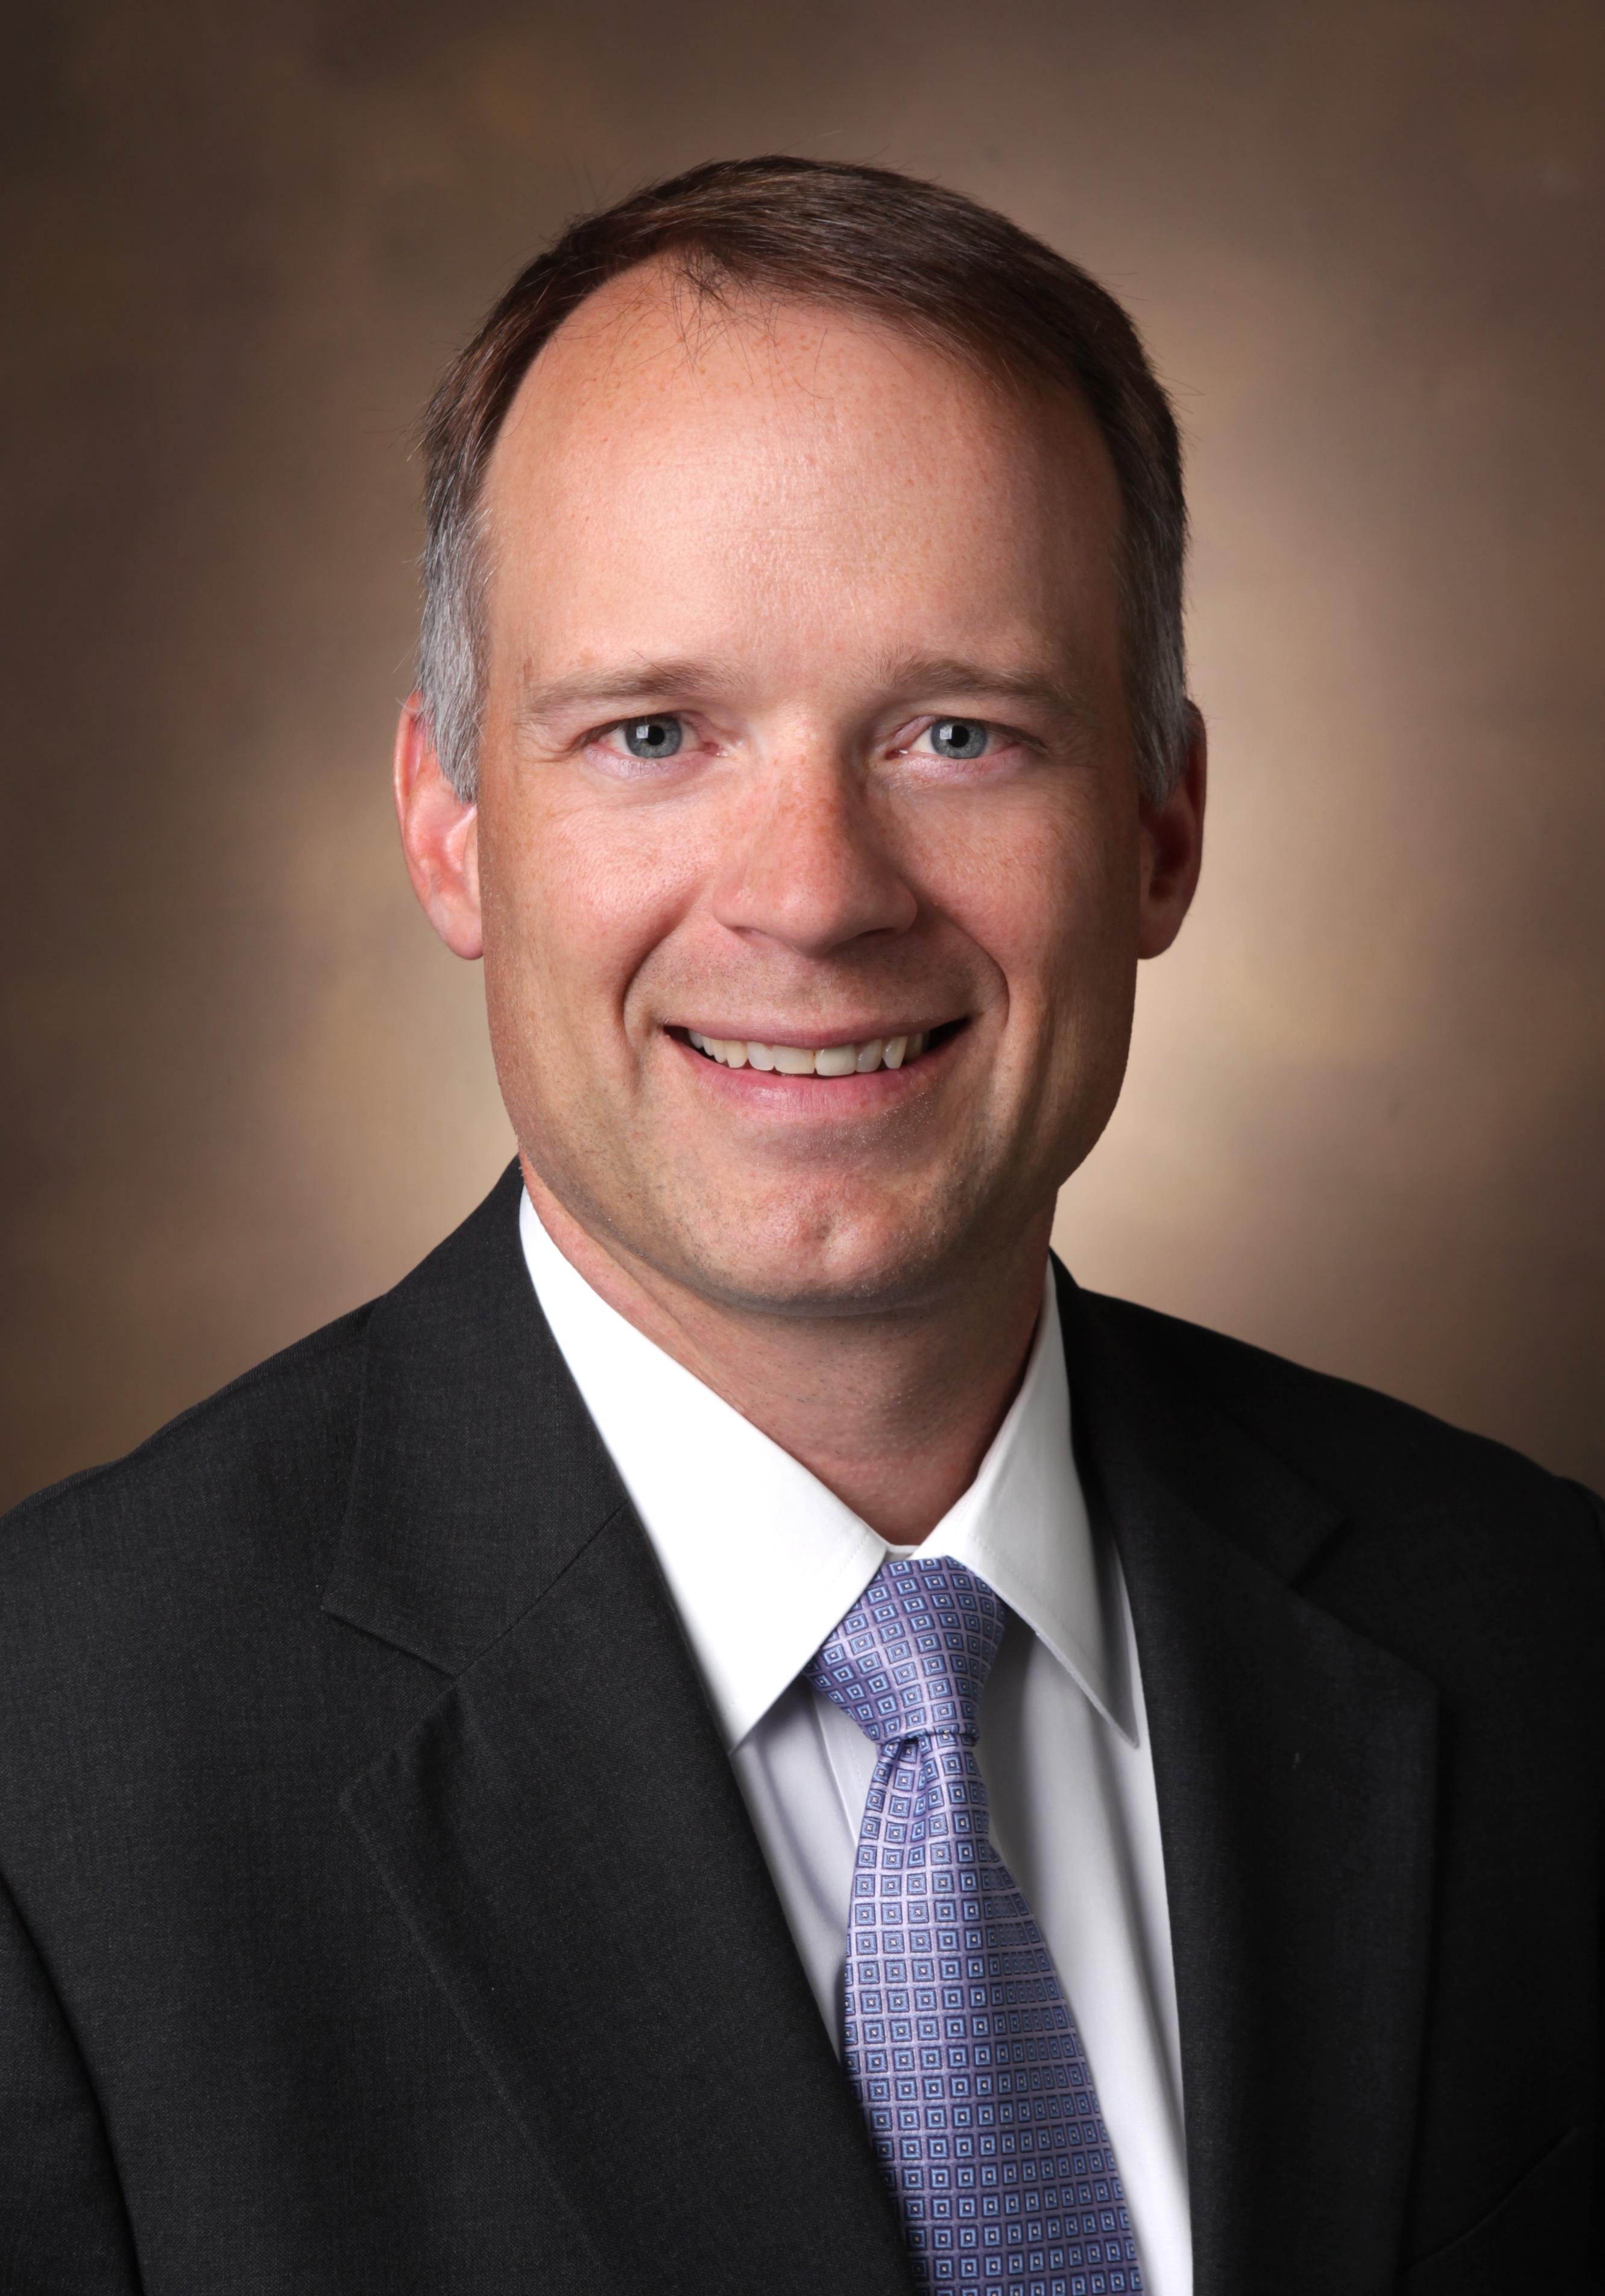 Mitch Edgeworth